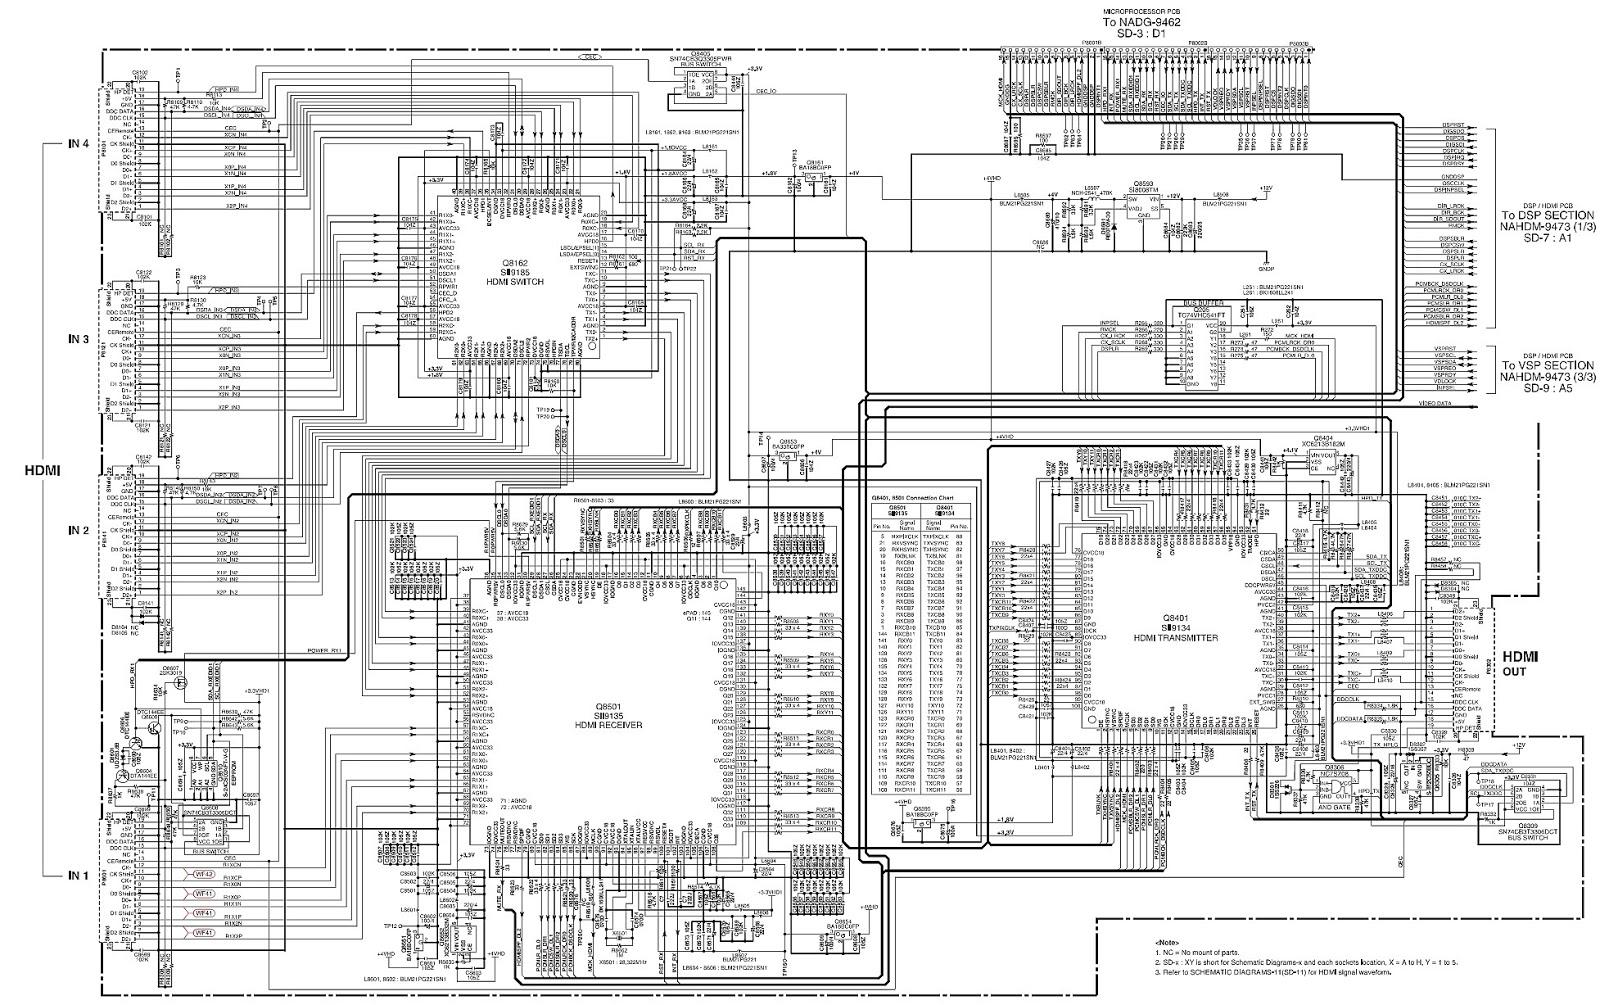 hdmi circuit diagram somurich com HDMI Schematic Symbol hdmi circuit diagram schematic diagrams,design